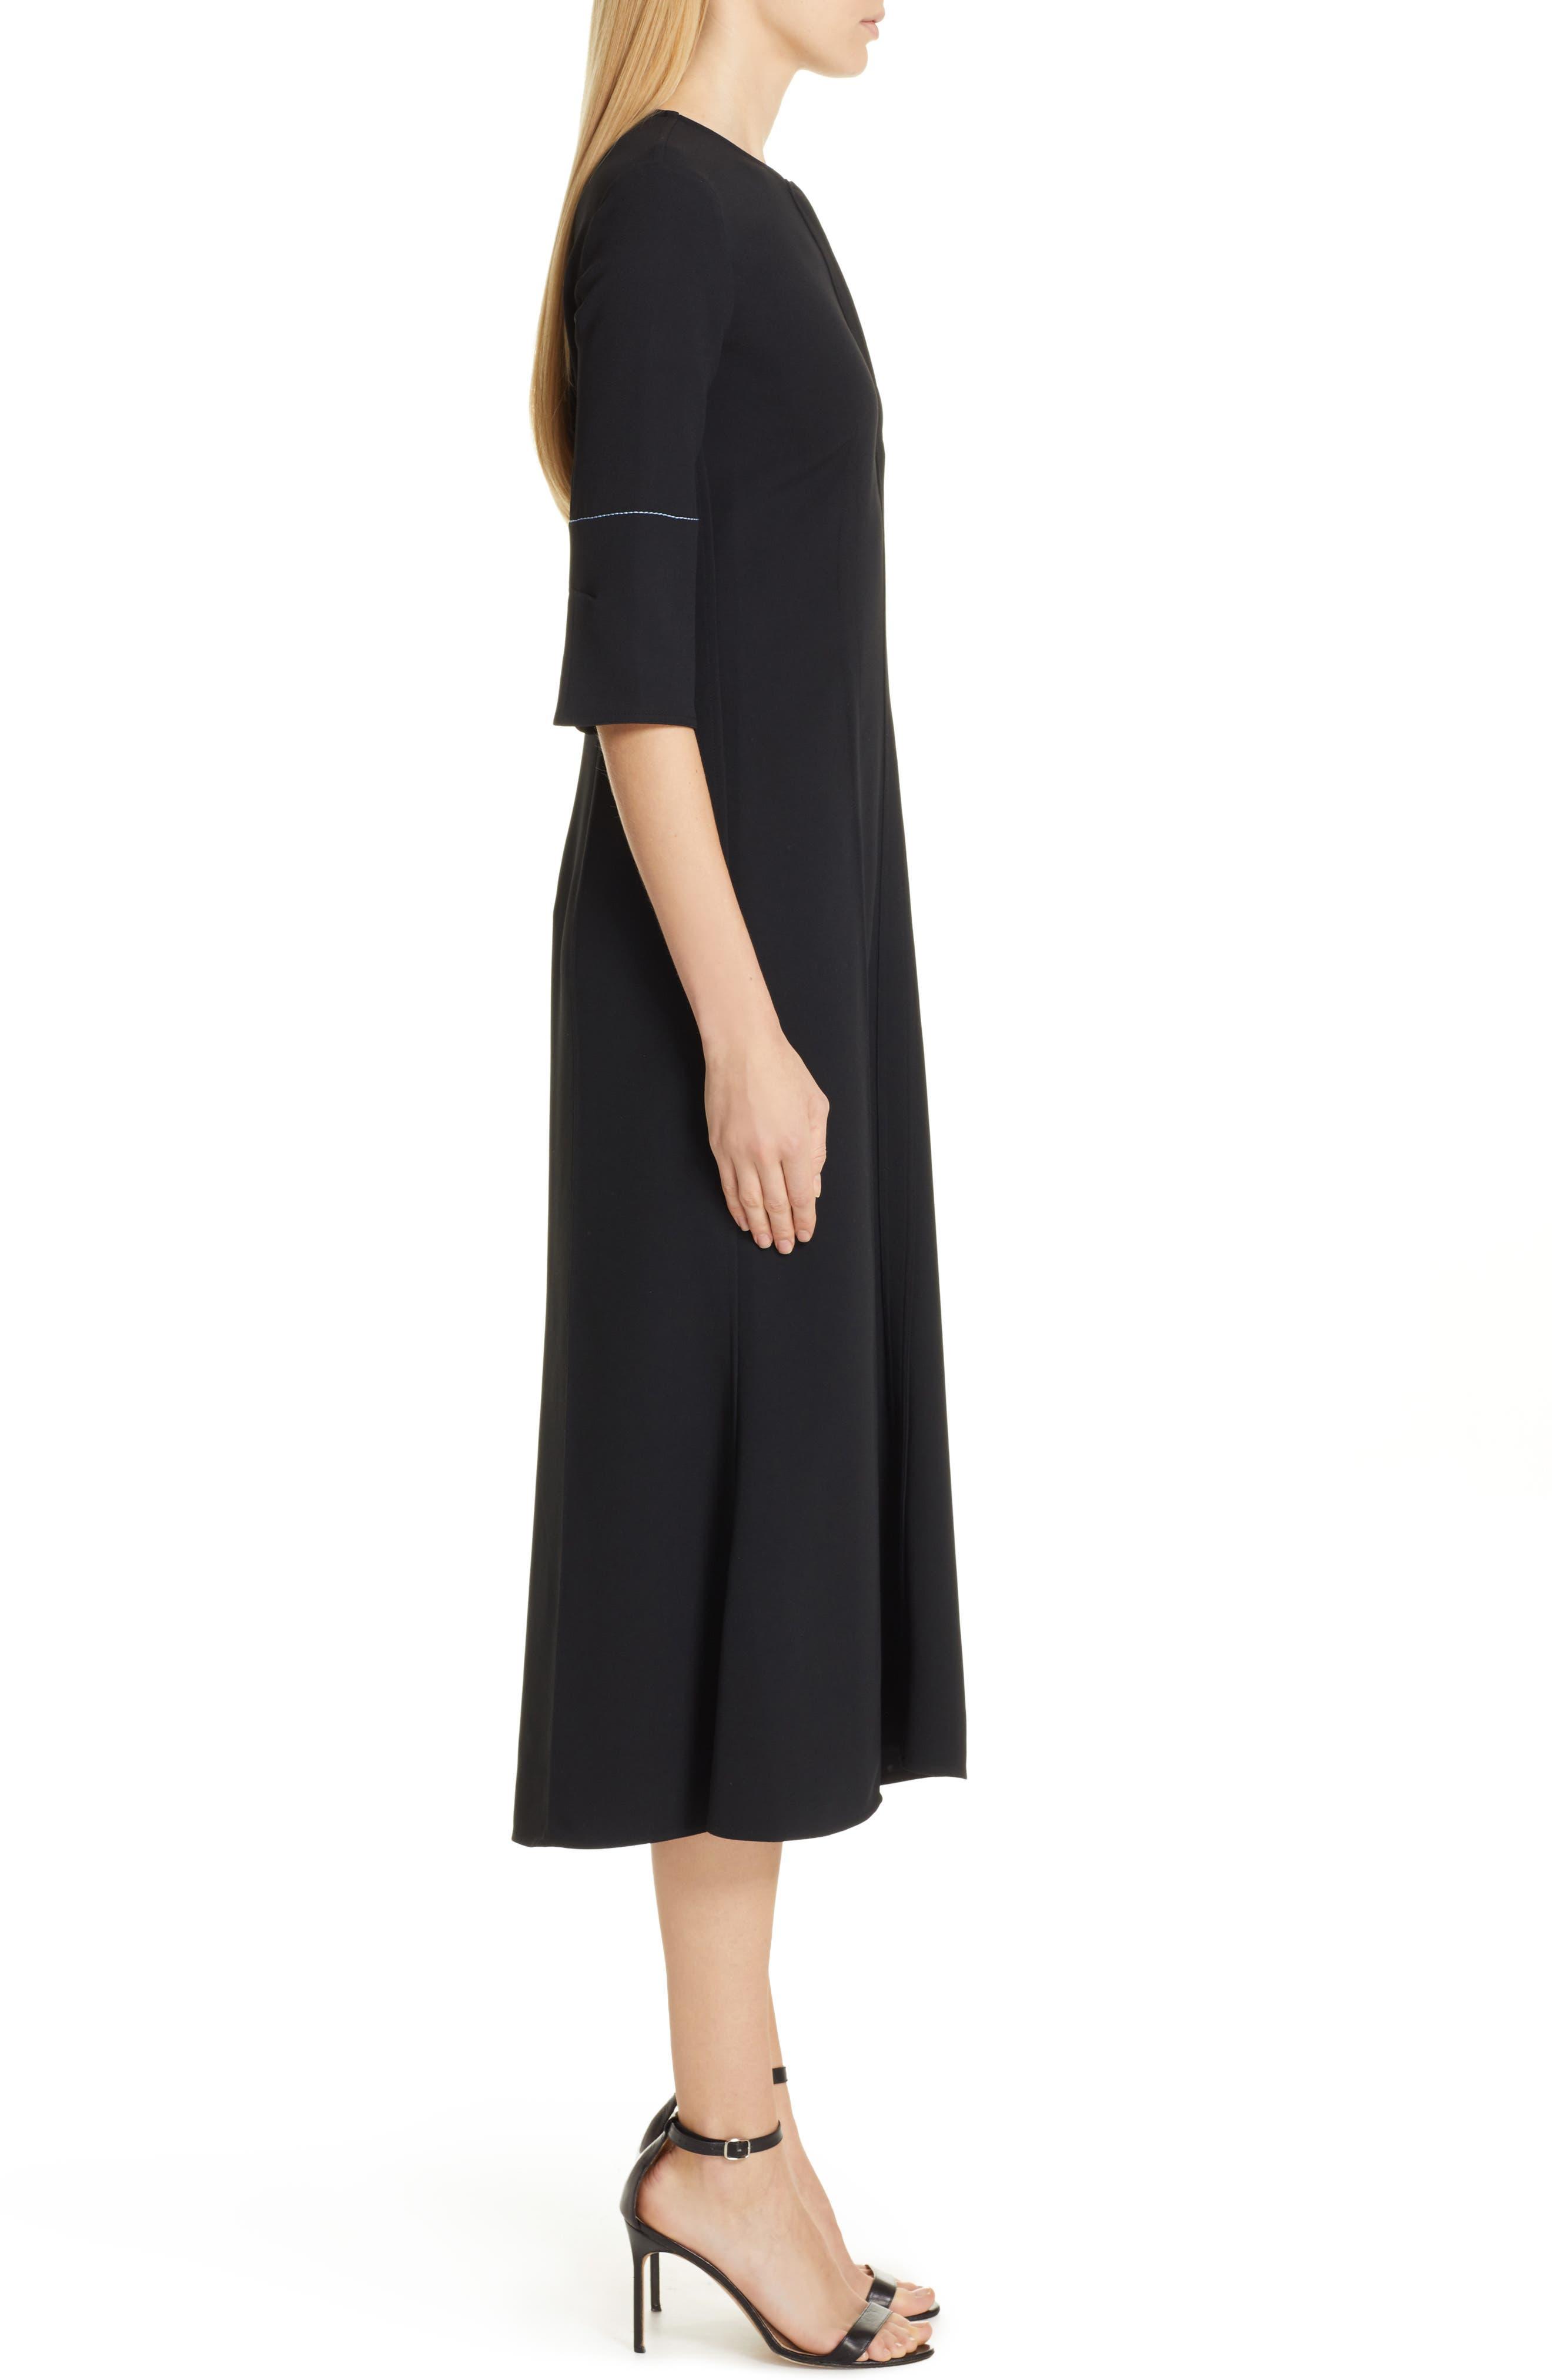 VICTORIA BECKHAM, Contrast Stitch Crepe Dress, Alternate thumbnail 4, color, BLACK